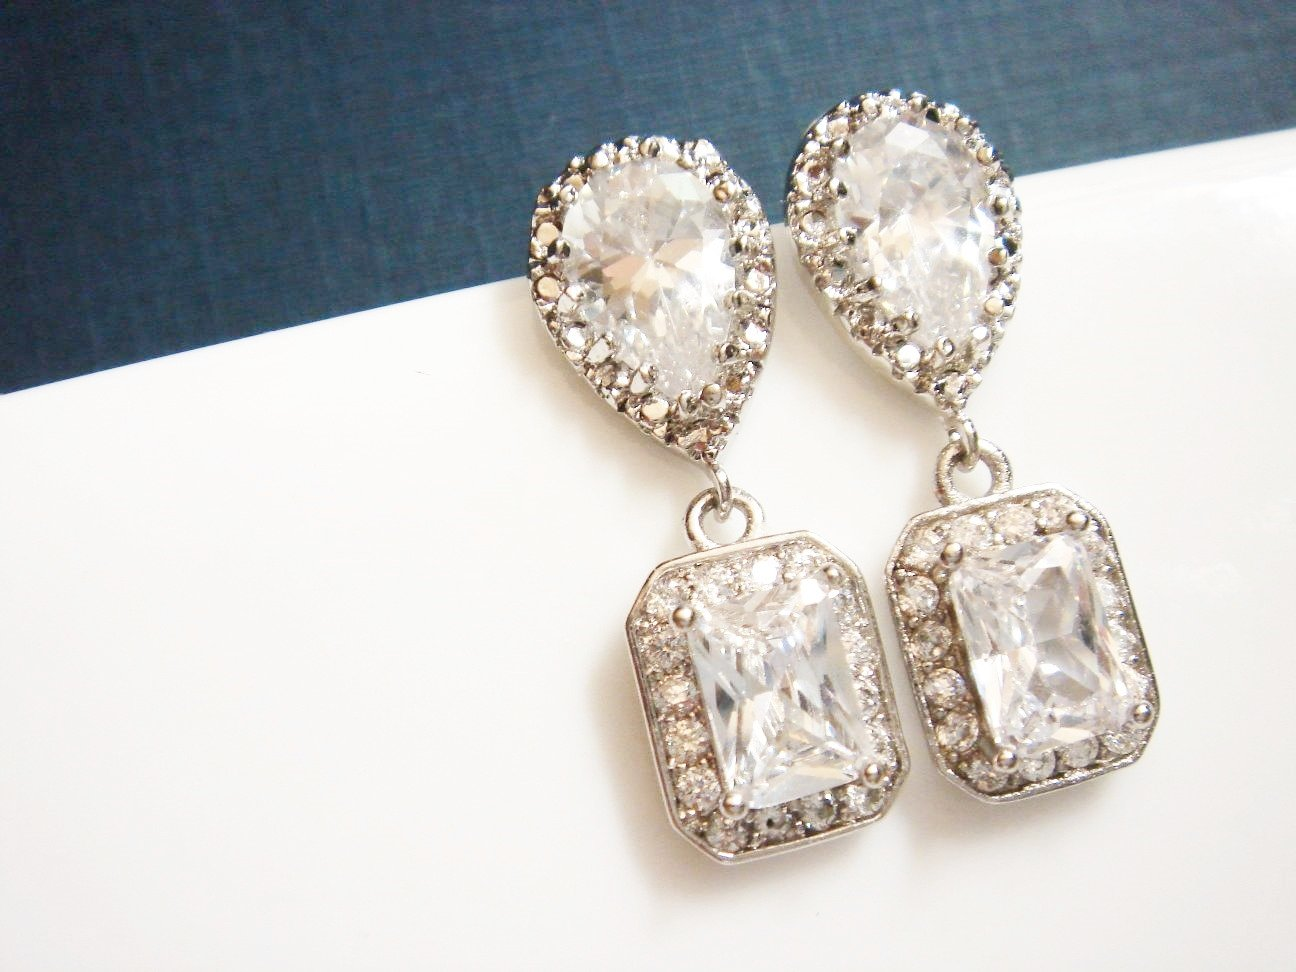 Halo Bridal Earrings - Cubic Zirconia Sterling Silver Wedding E033